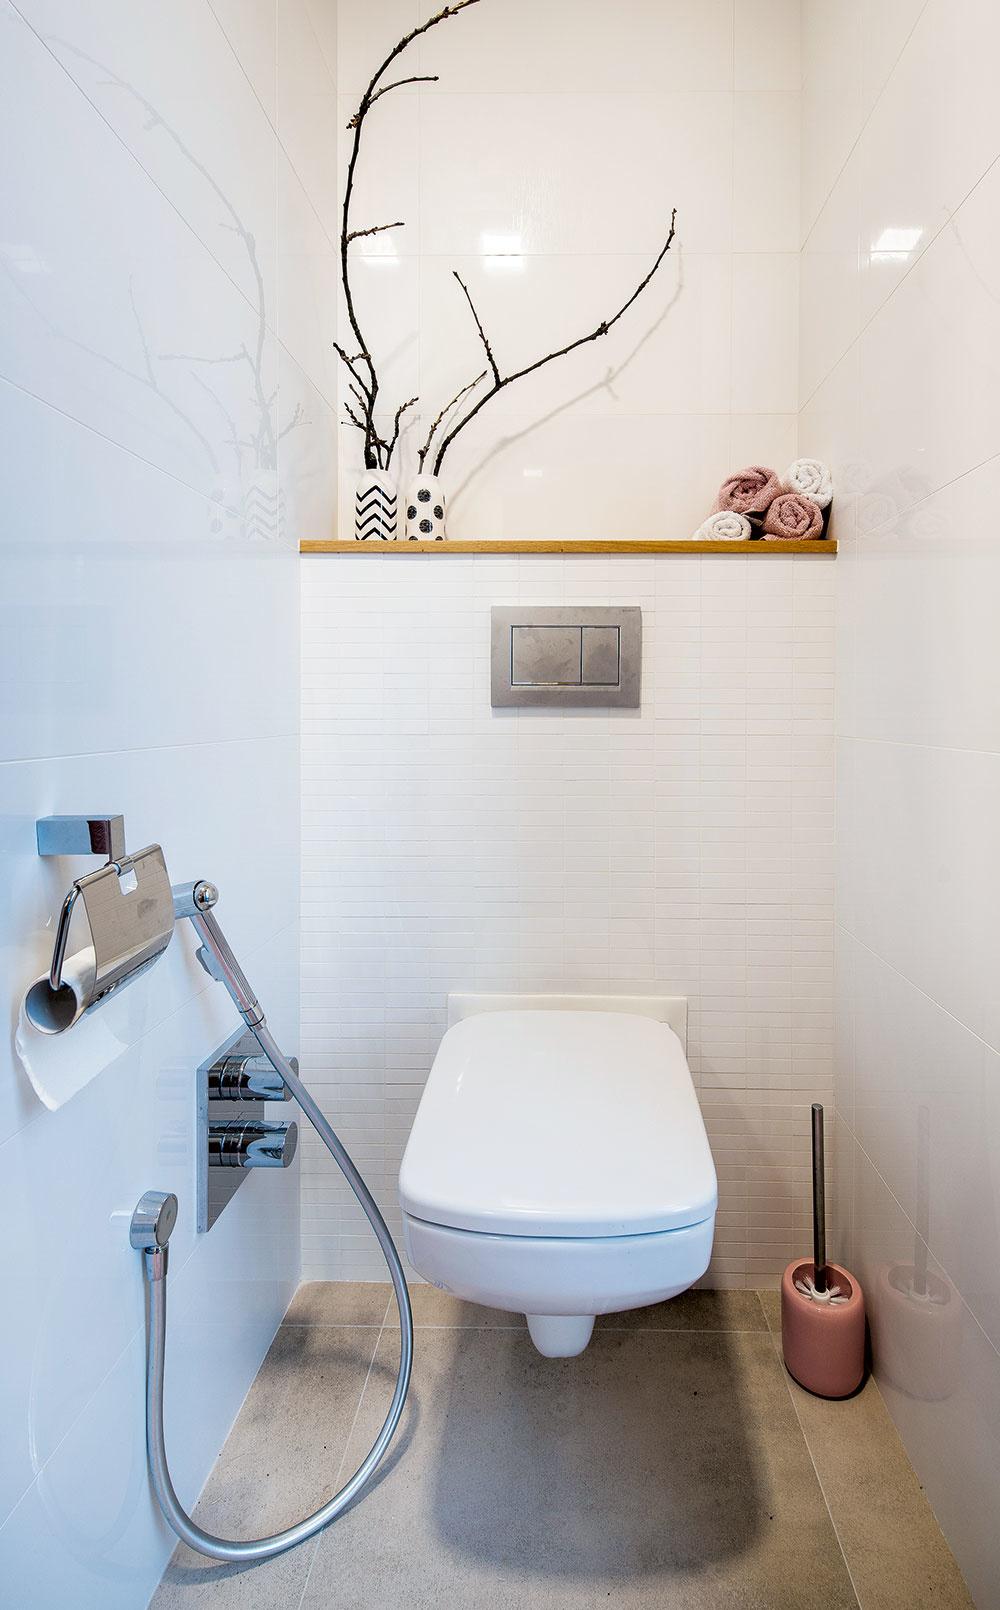 dievčenská toaleta